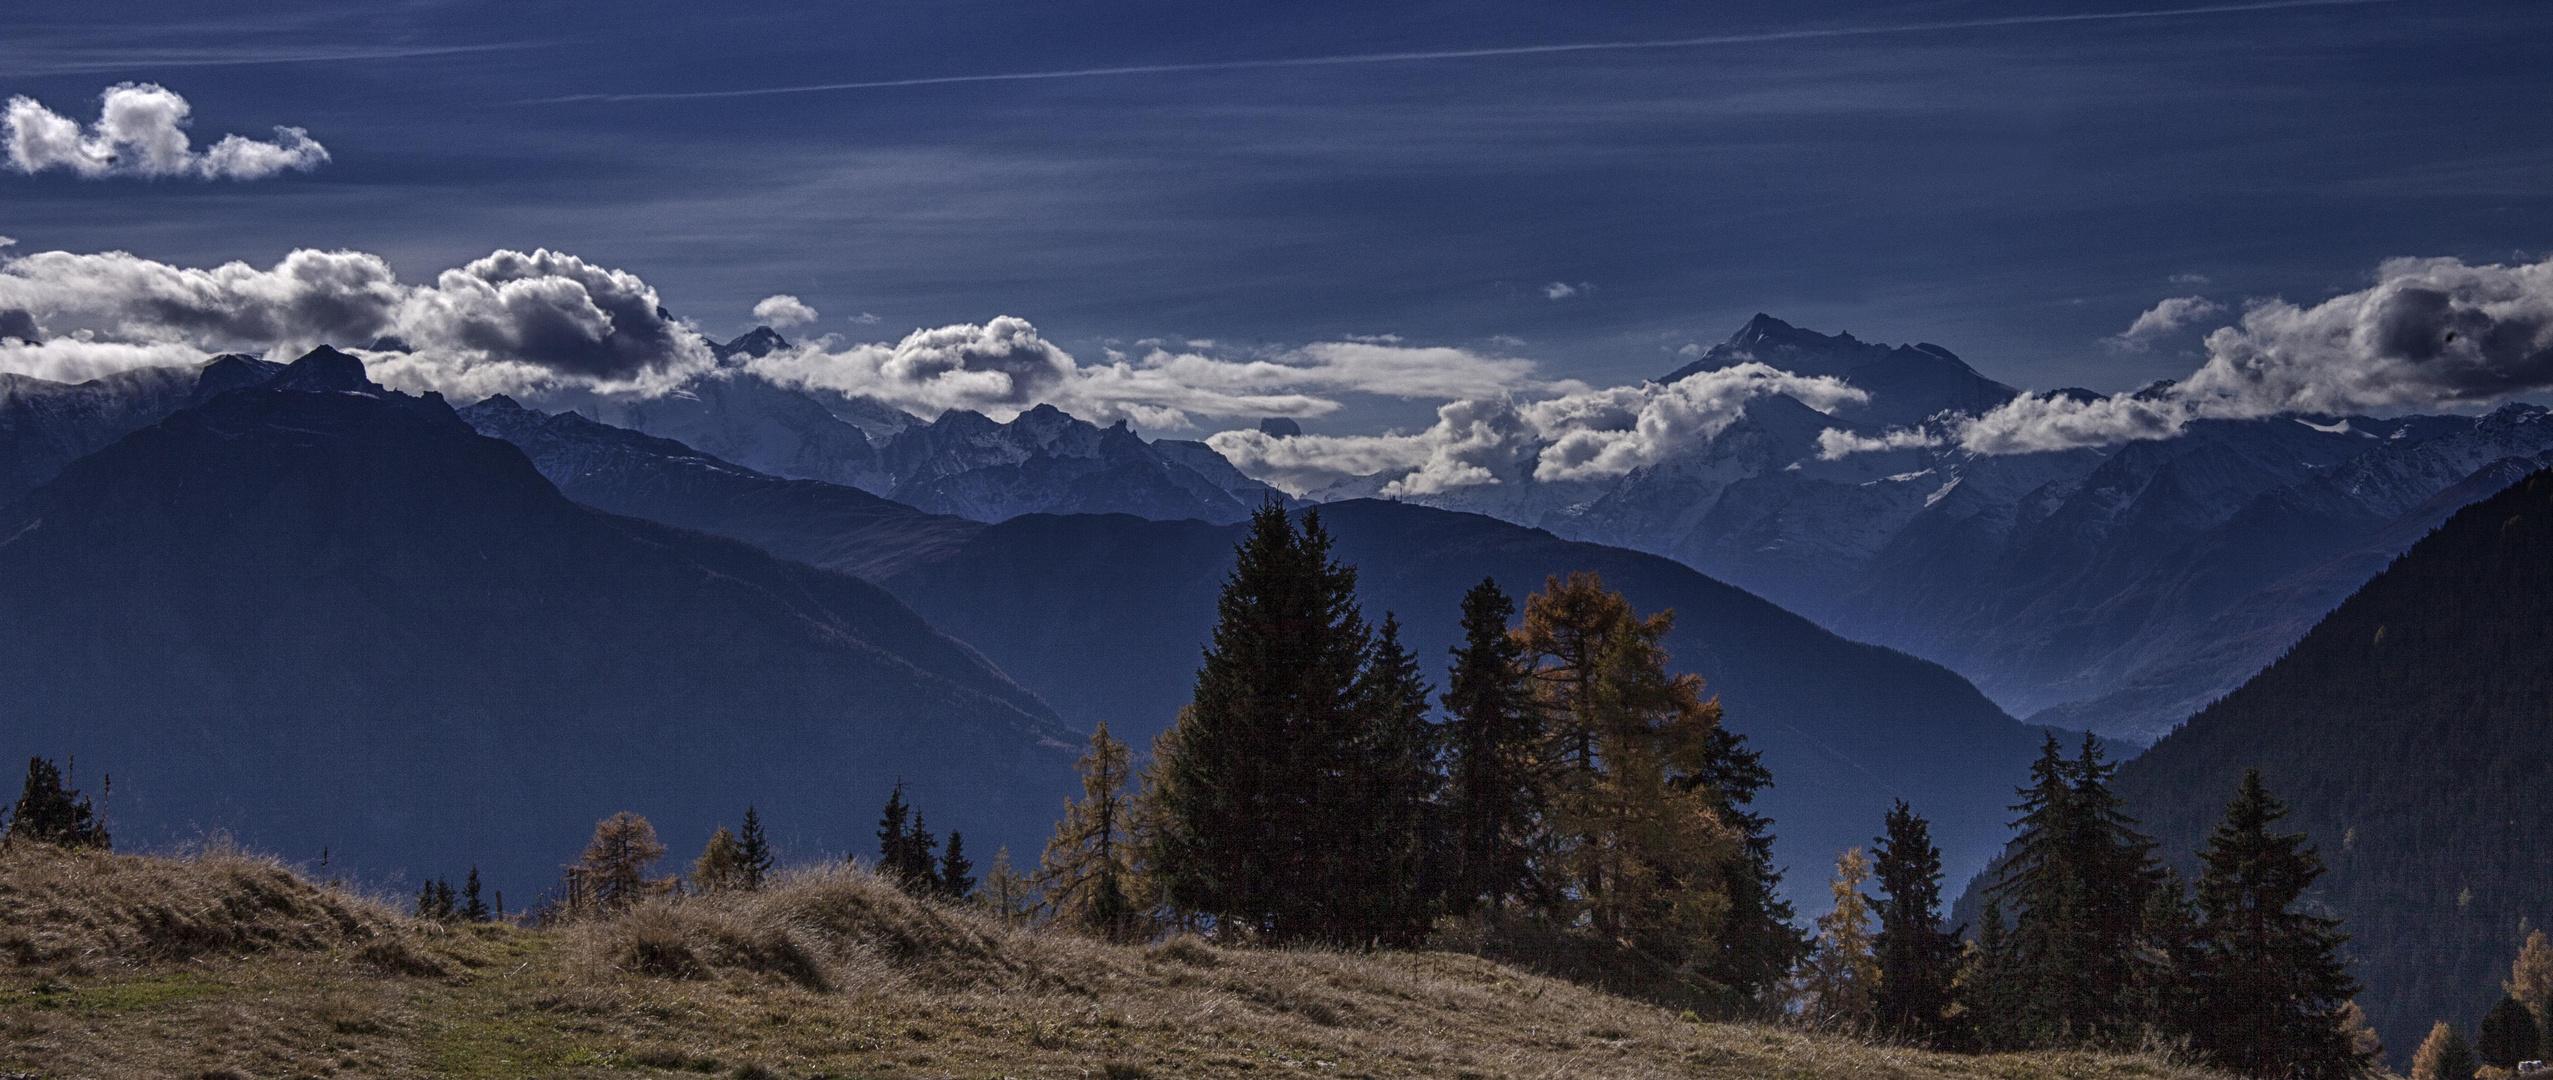 Poesievolle Novemberlandschaft im Wallis